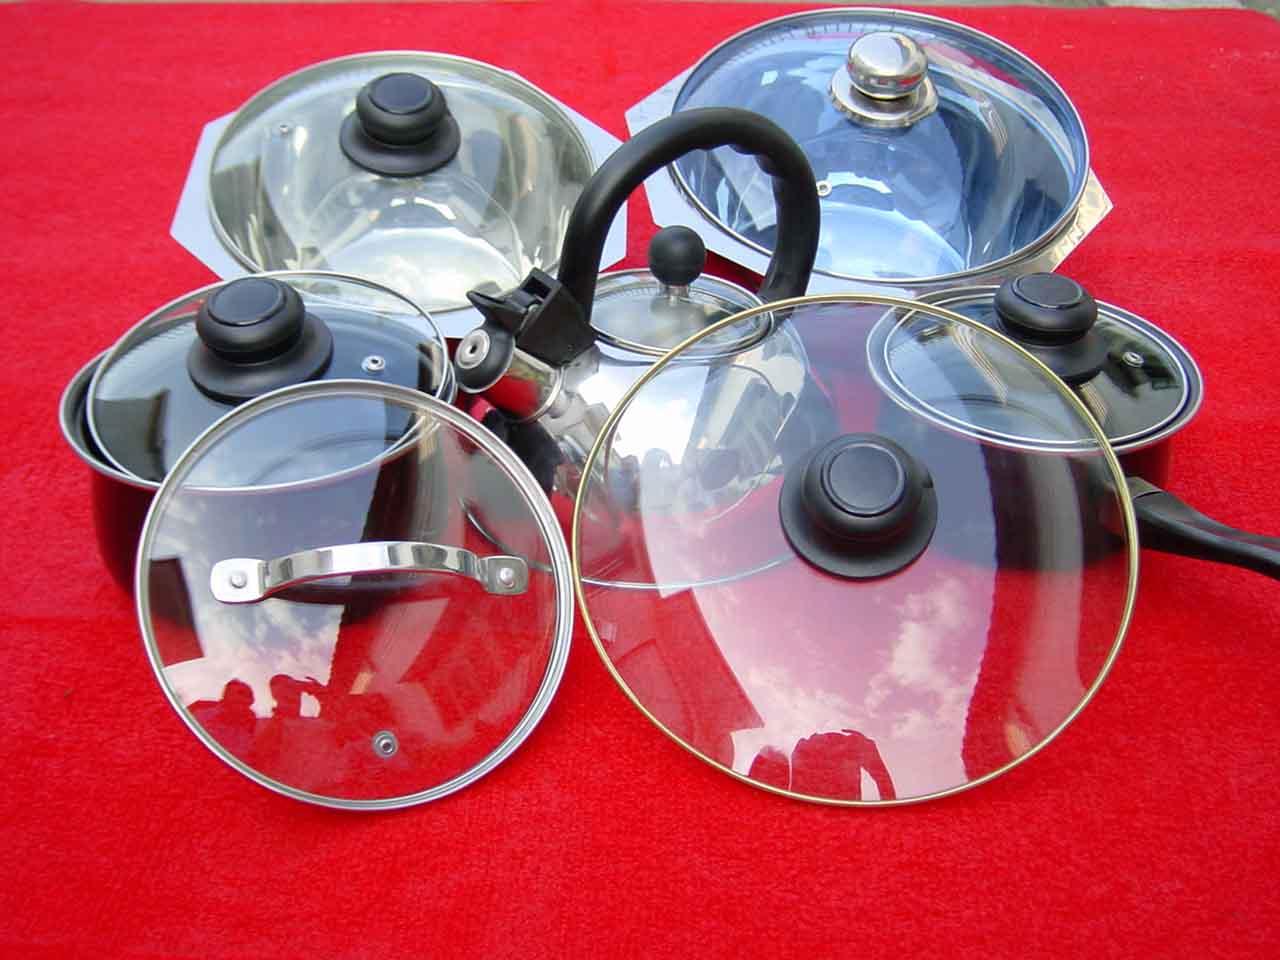 Type G Cookware Glass Lids (Тип G посуда стеклянной крышкой)